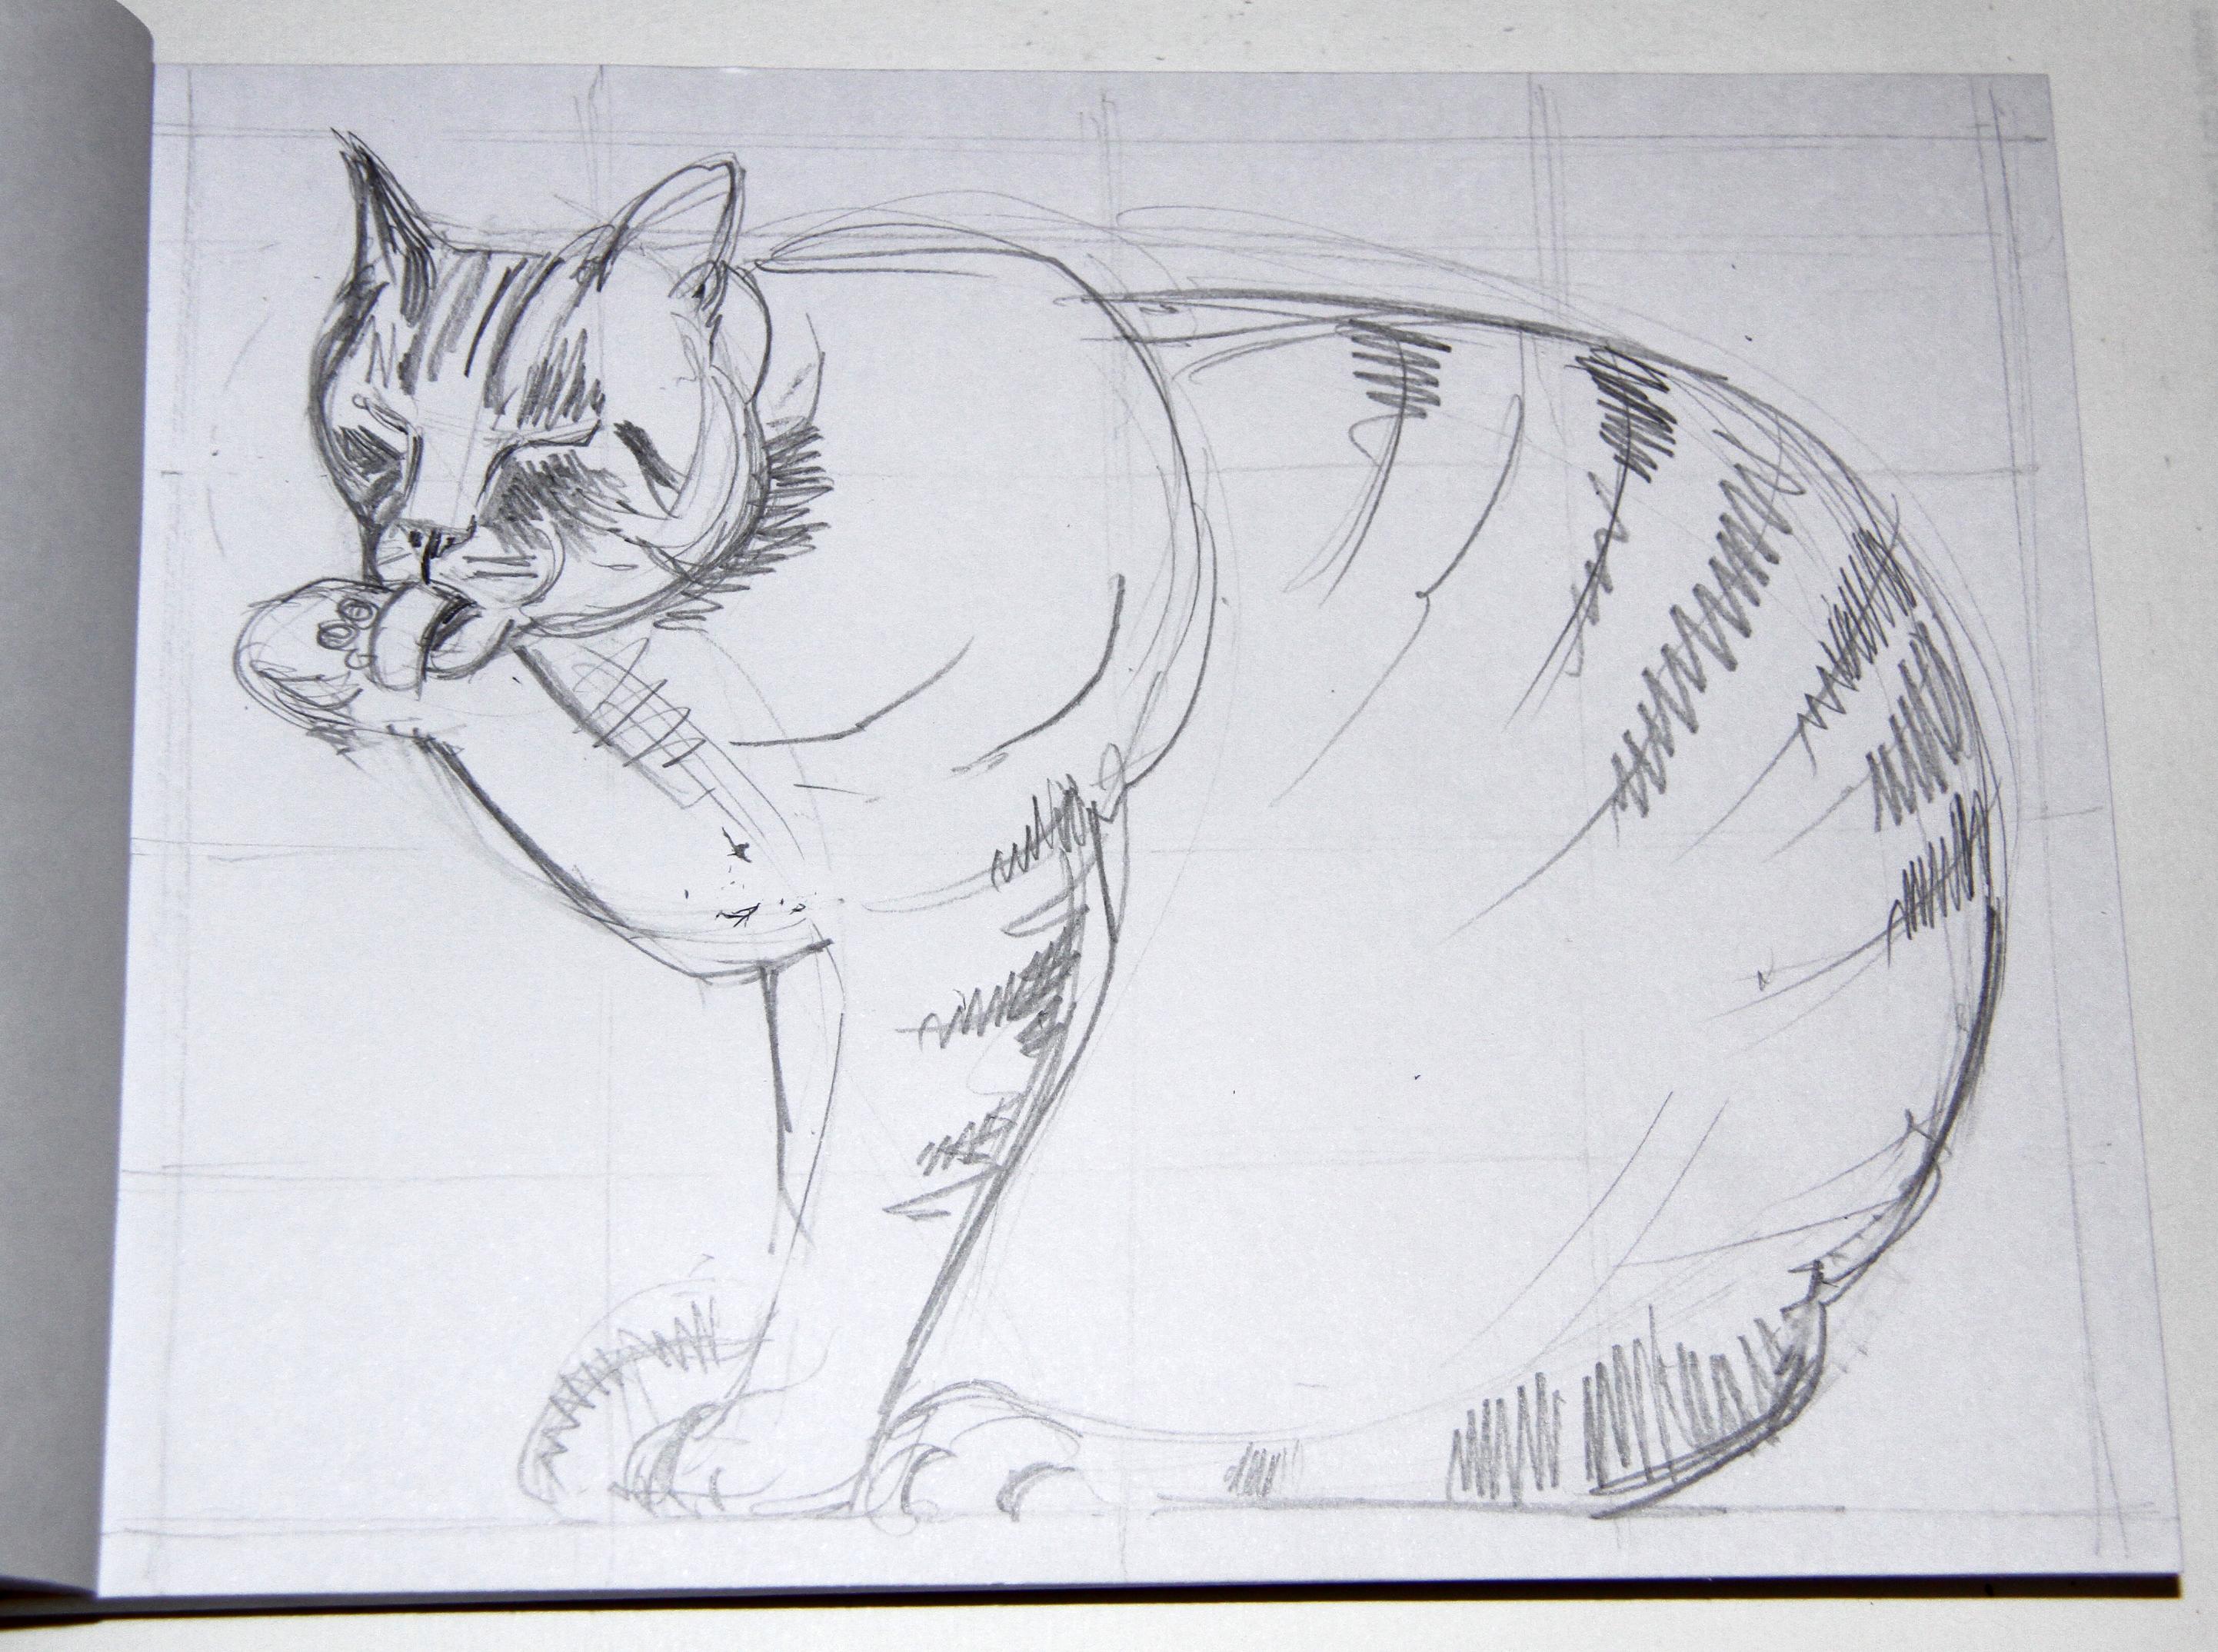 Free Images Artwork Sketch Illustration Chat Zeichnung Dessin